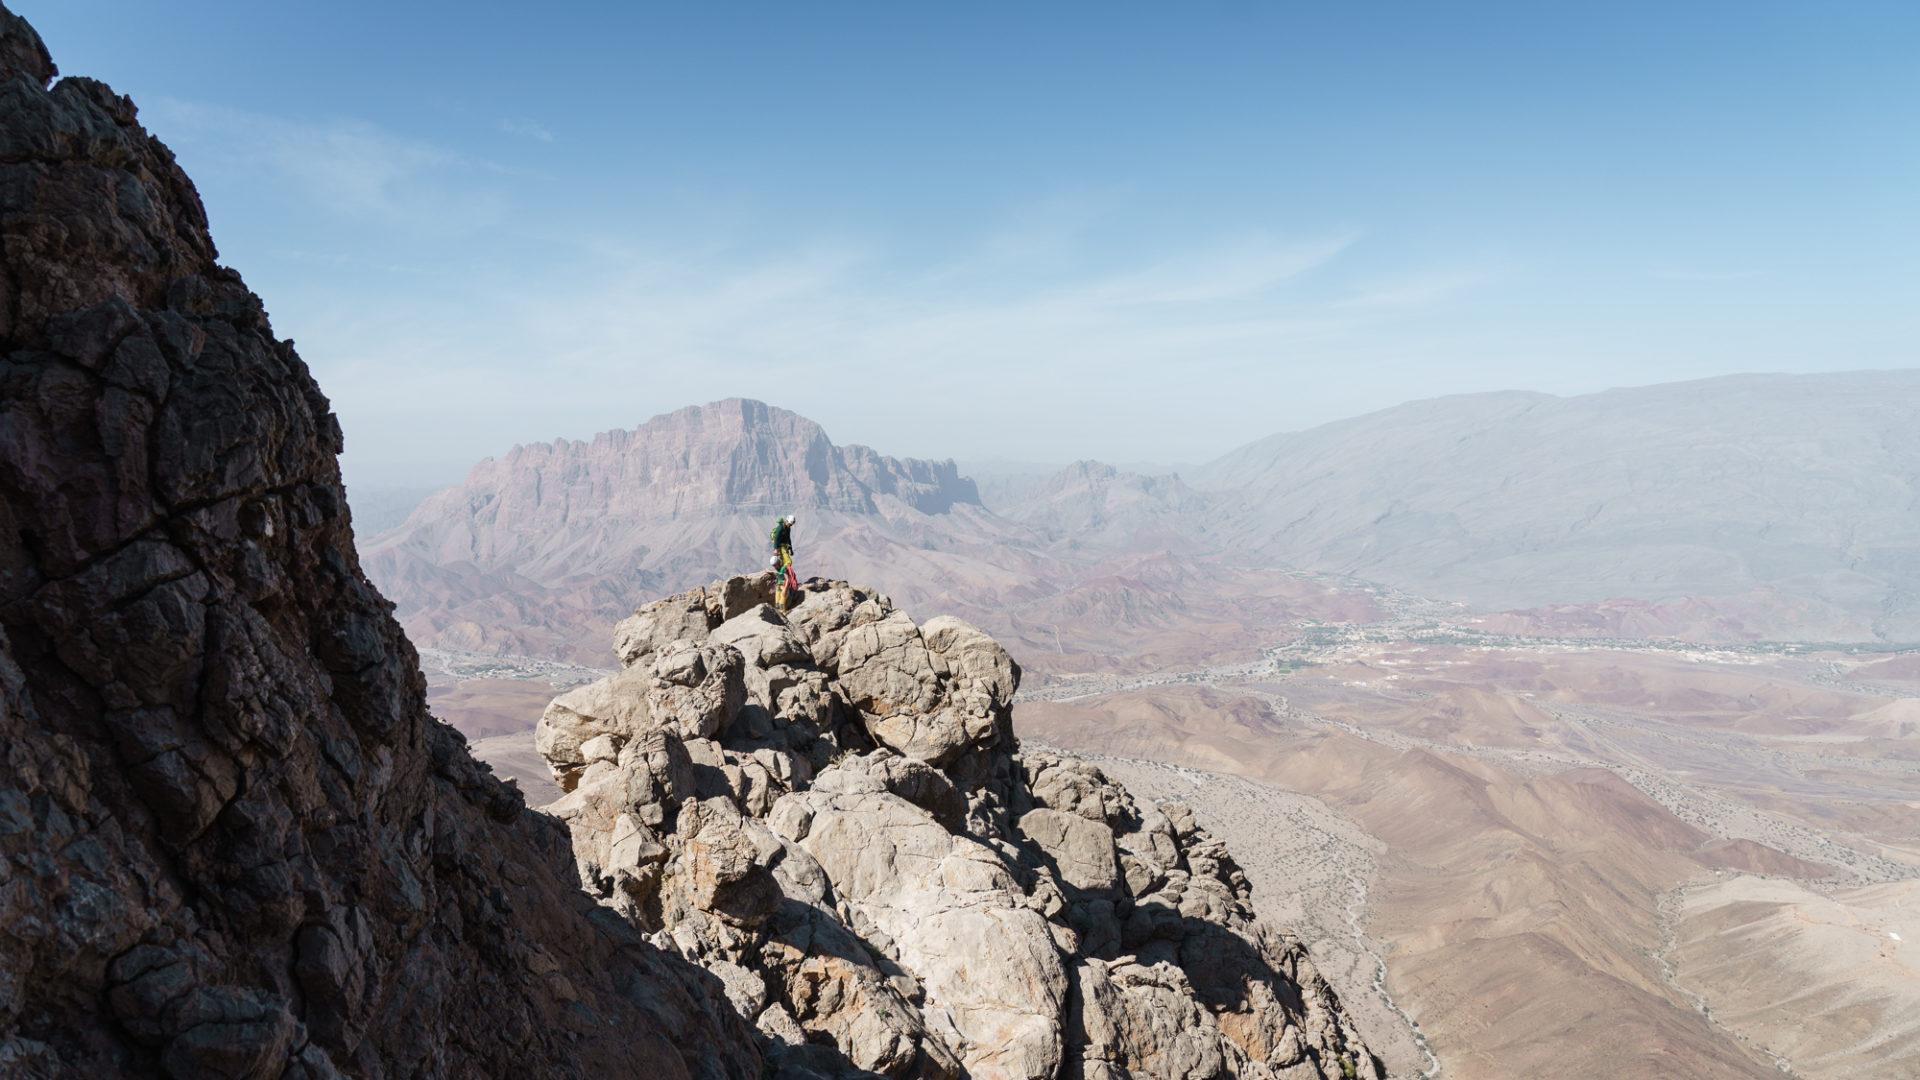 Projekt Alpinist im Sultanat Oman